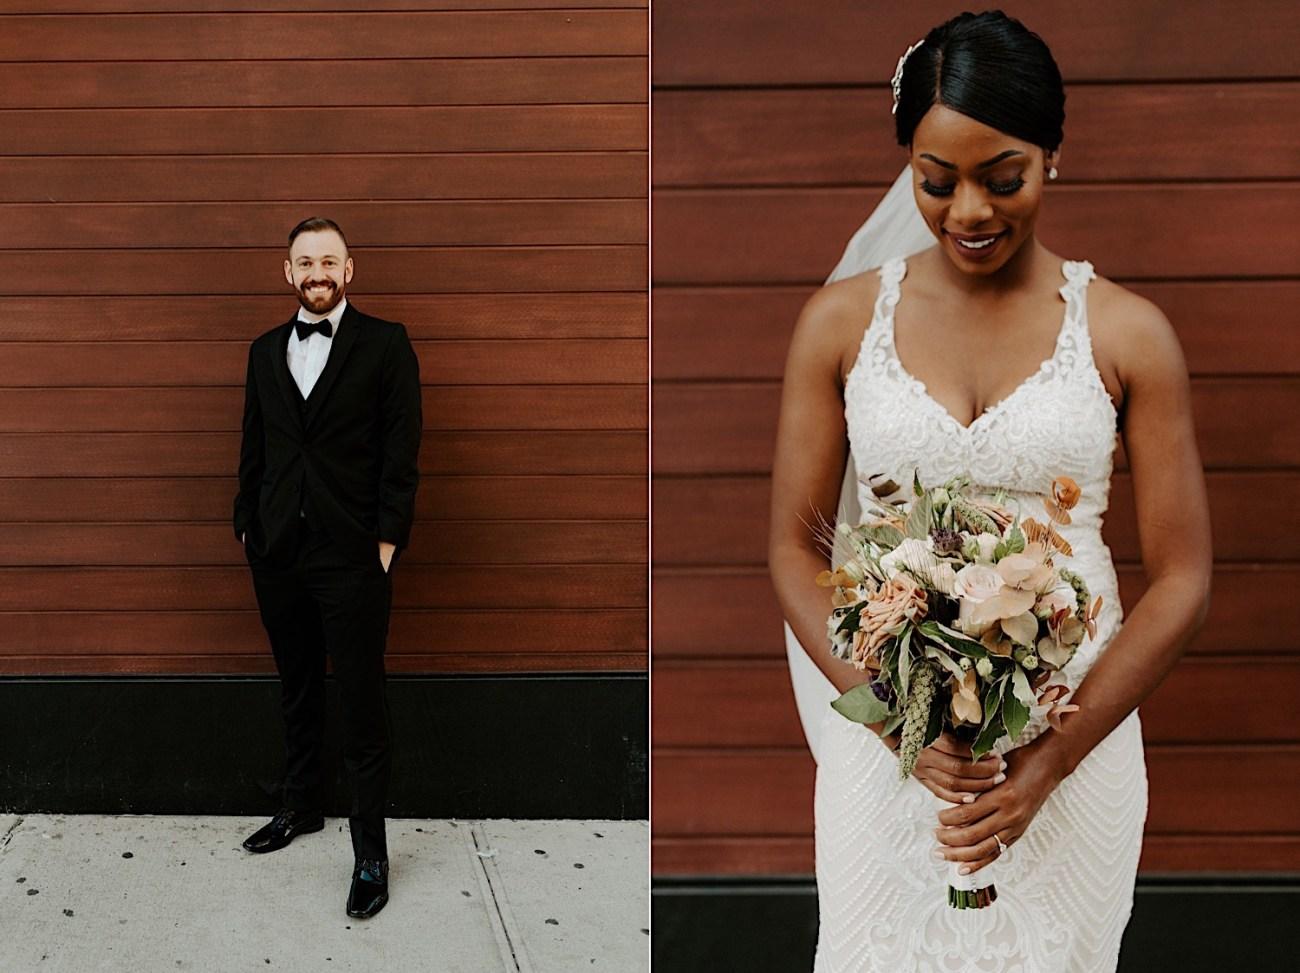 Brooklyn Dumbo Elopement NYC Wedding Photographer New York Elopement 19